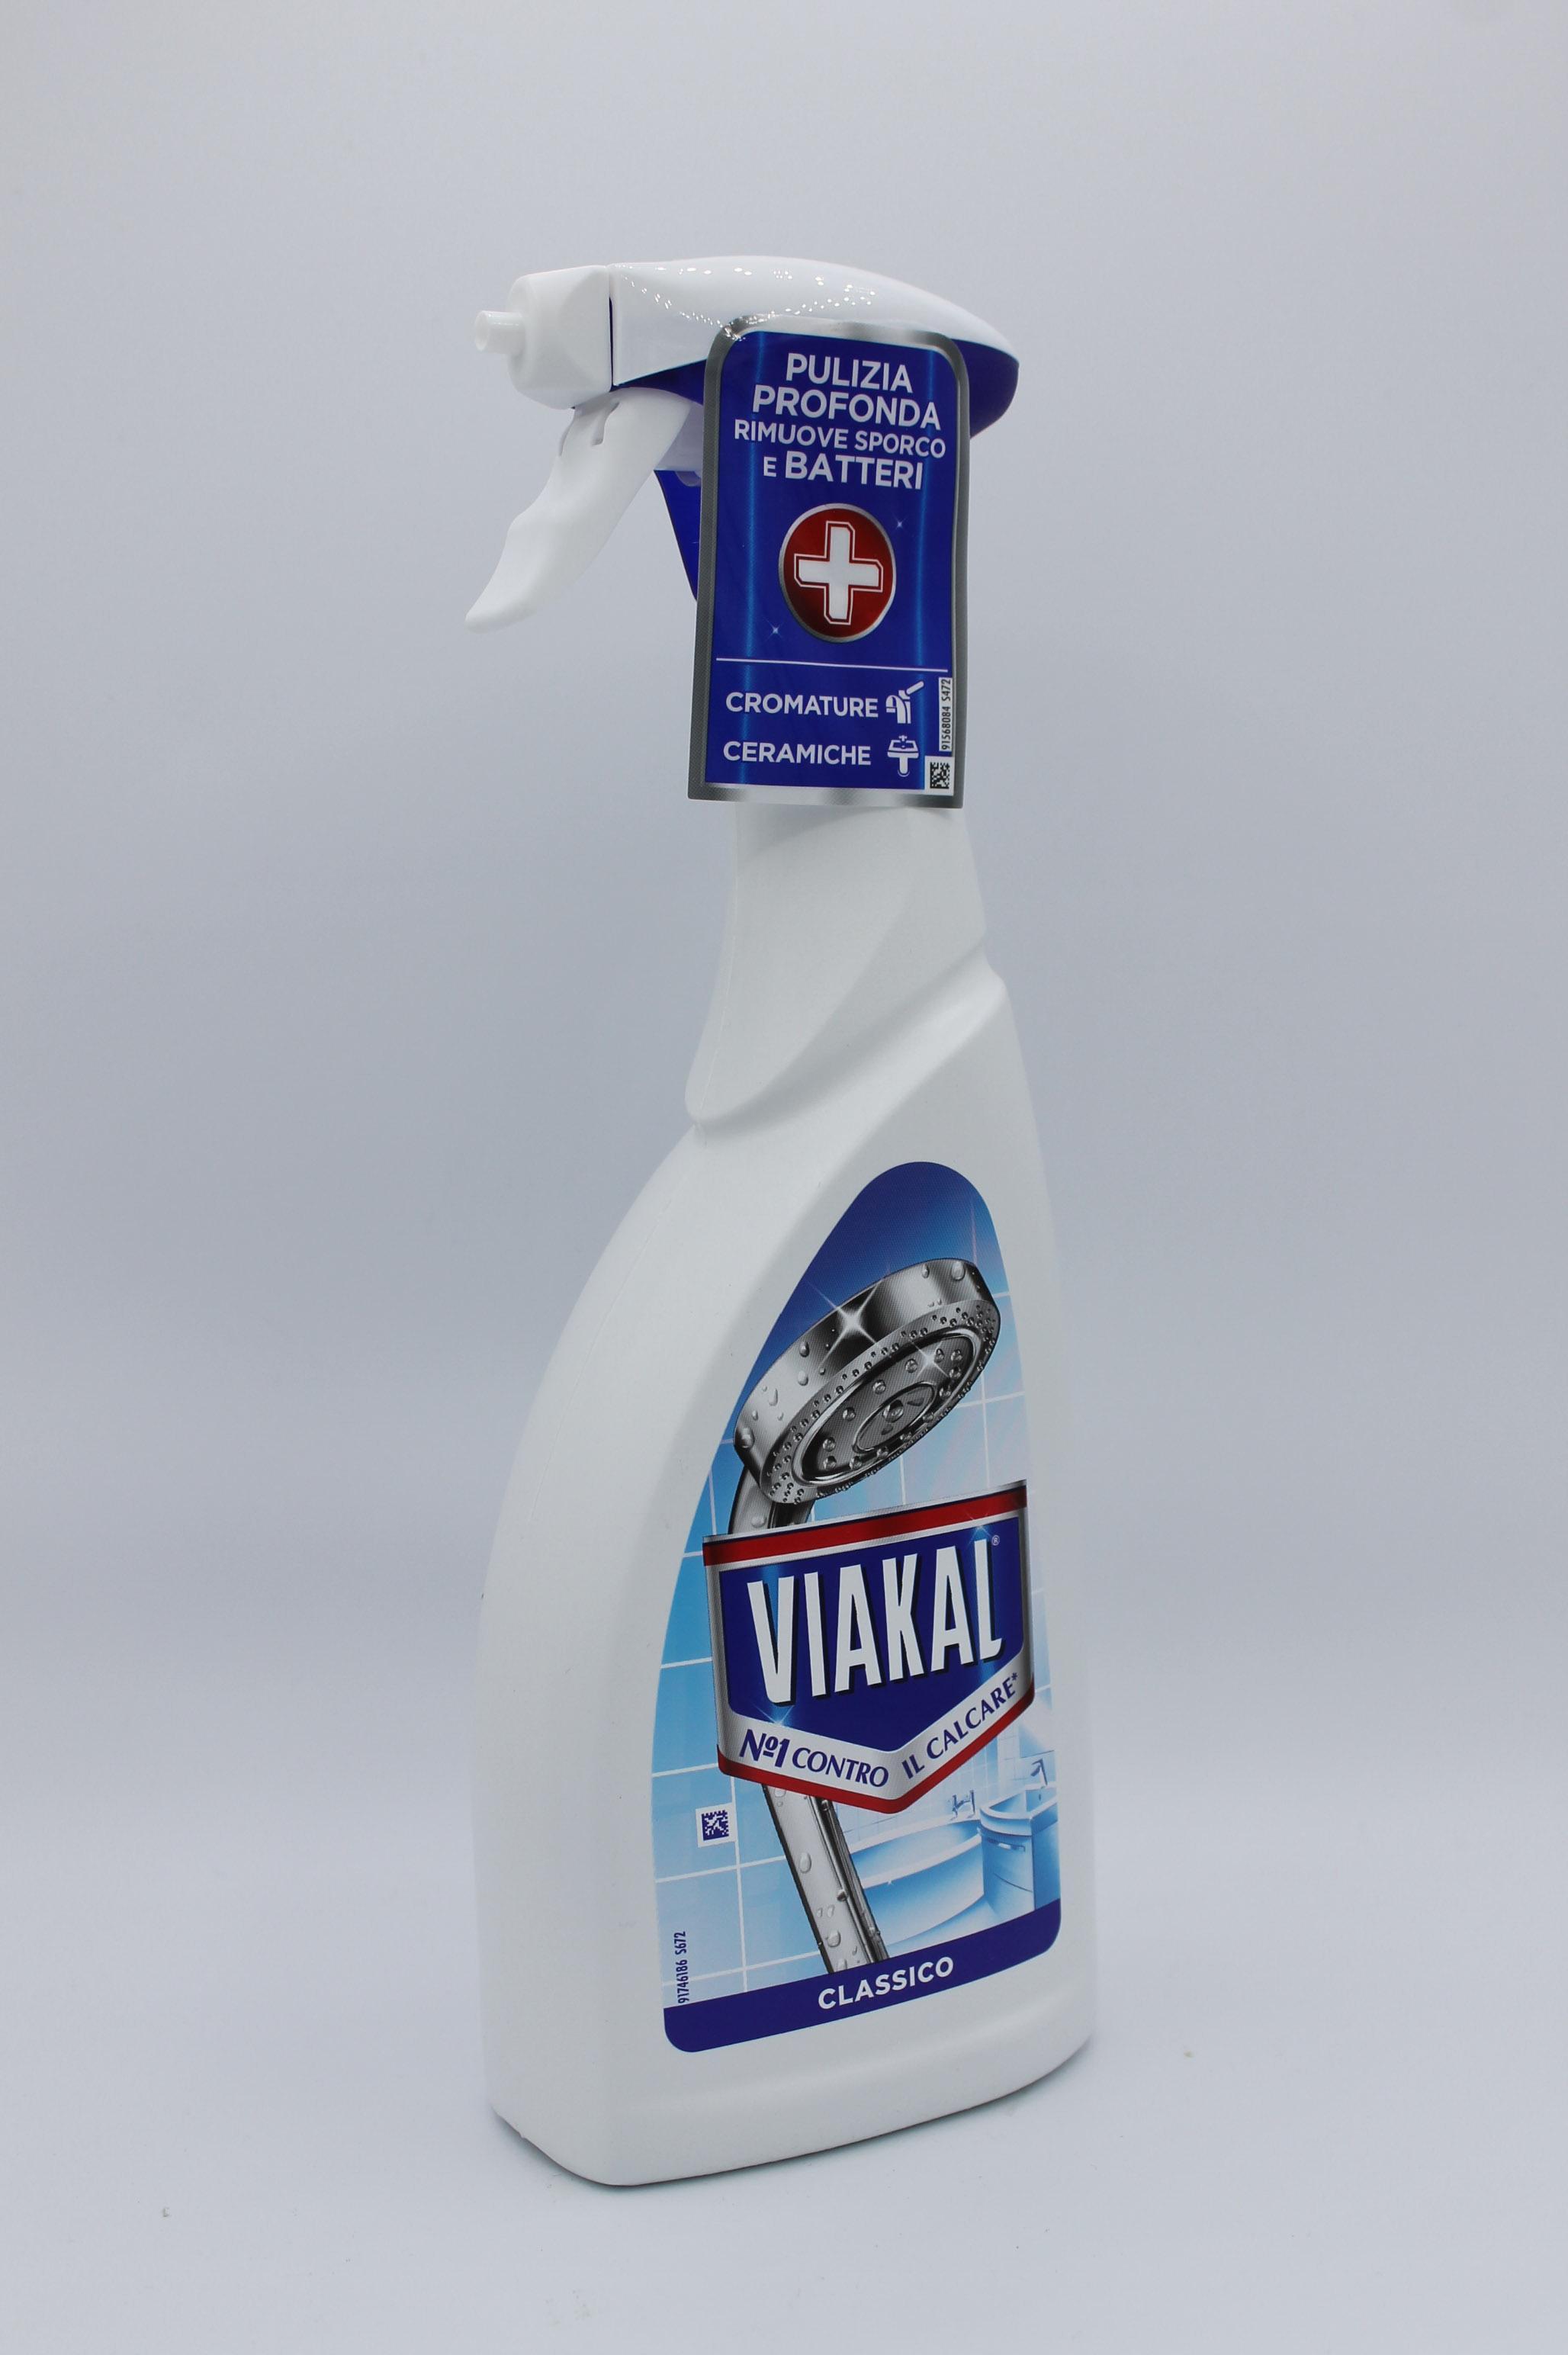 Viakal anticalcare spray 700ml.